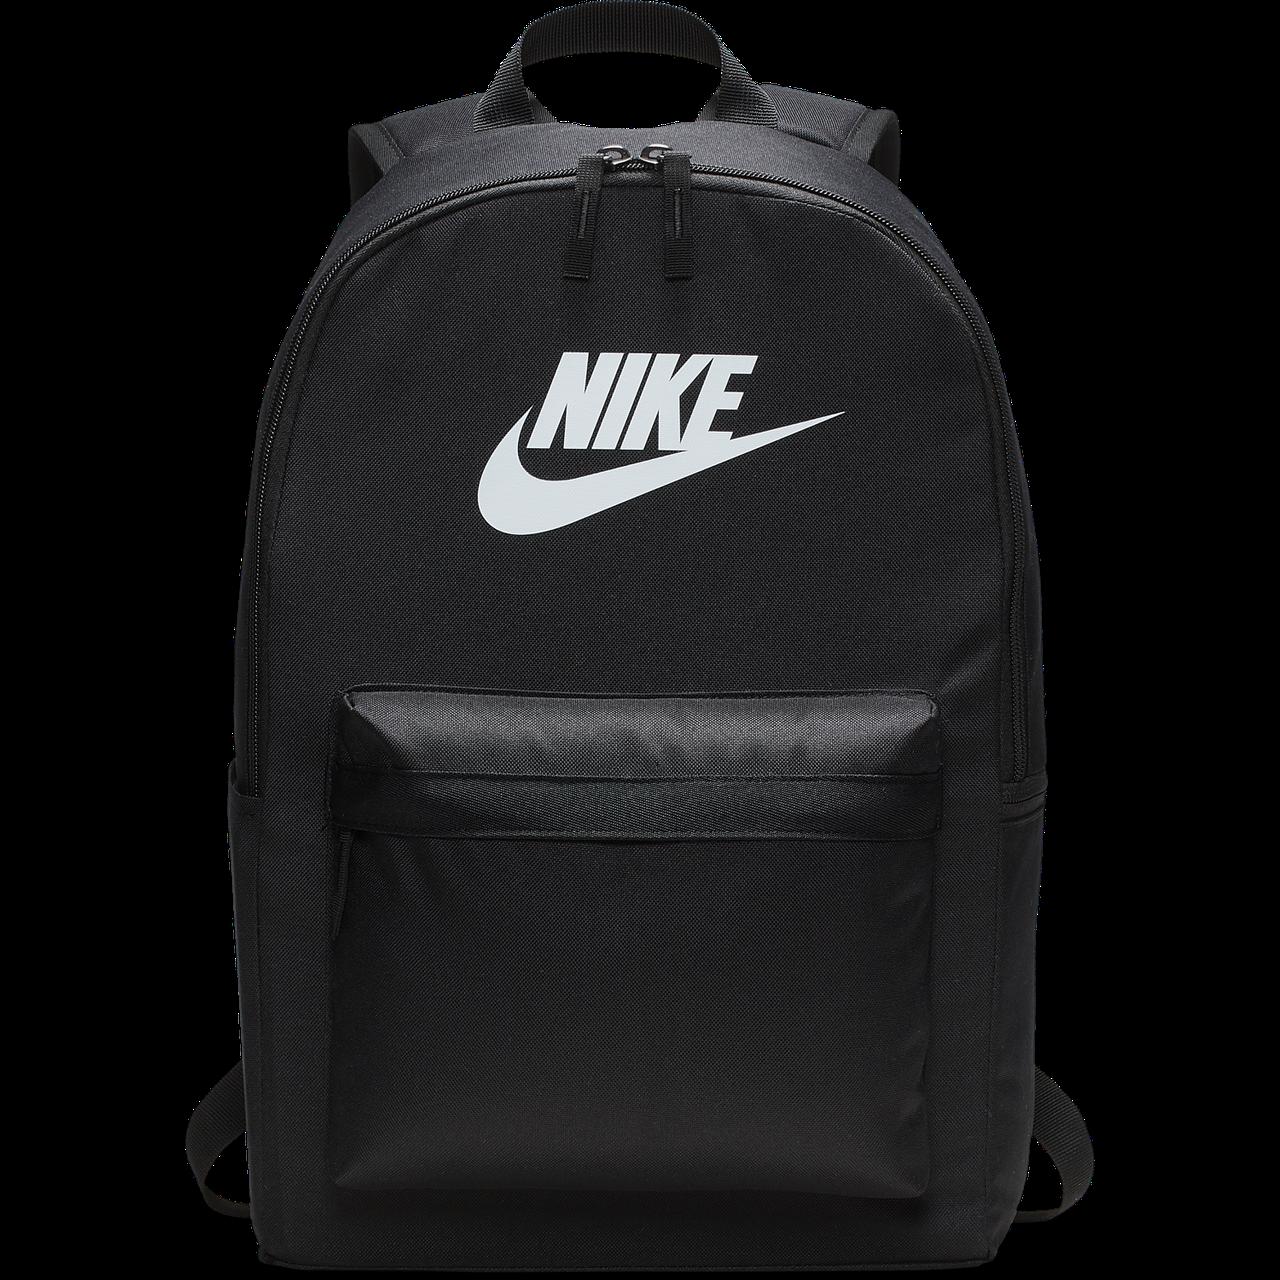 Рюкзак Nike Heritage Backpack 2.0 BA5879-011 Черный (193145973343)